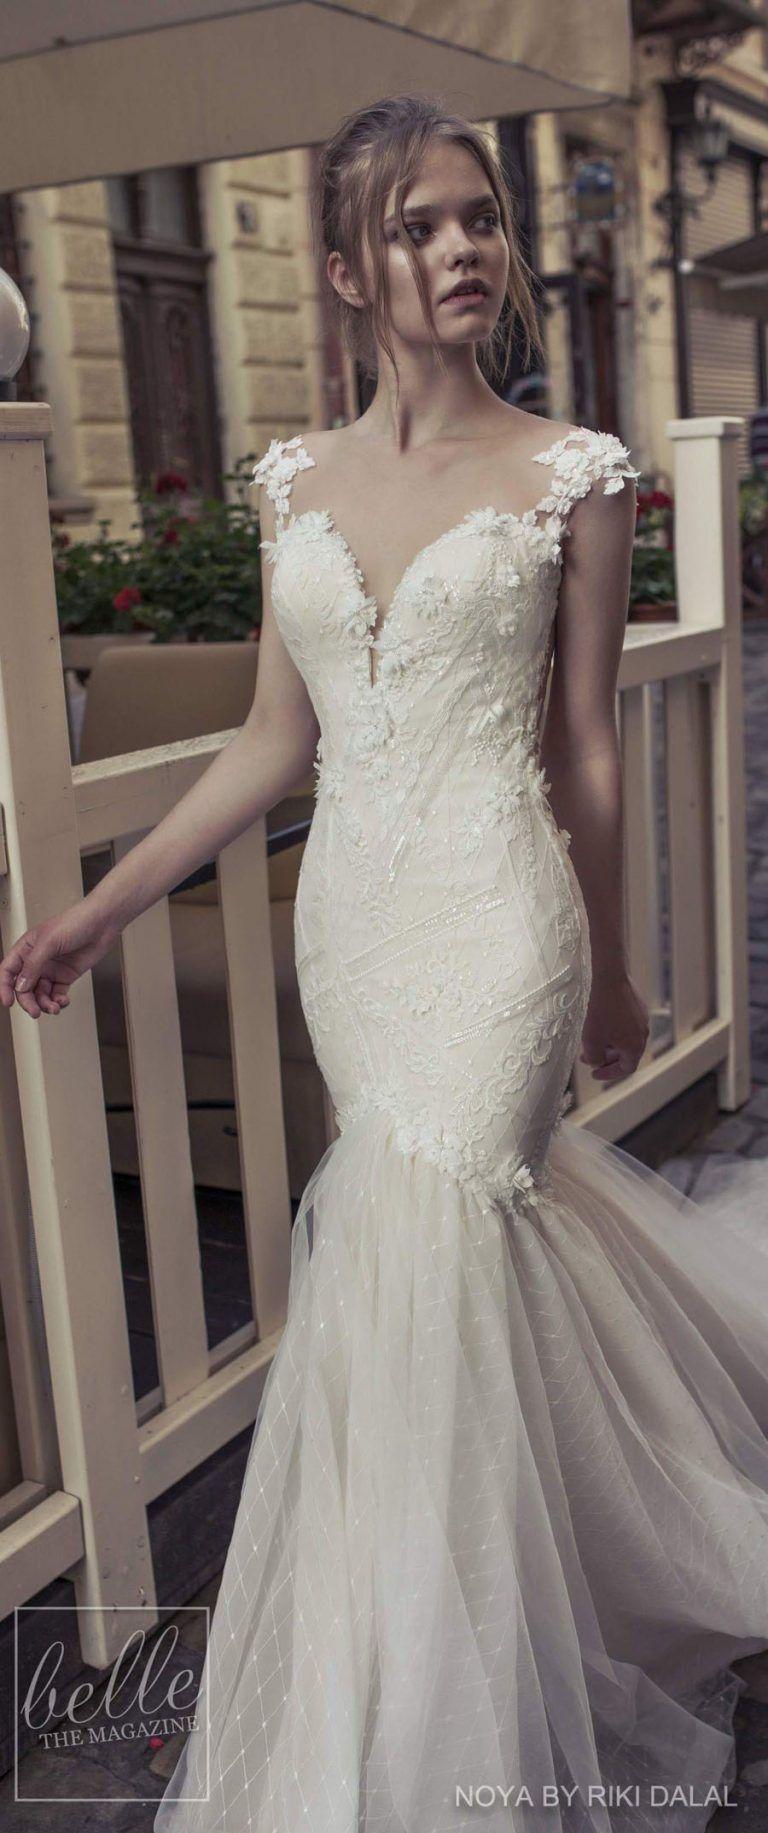 Mermaid ruffle wedding dress  Noya by Riki Dalal  in   MermaidRuffle Wedding Dresses